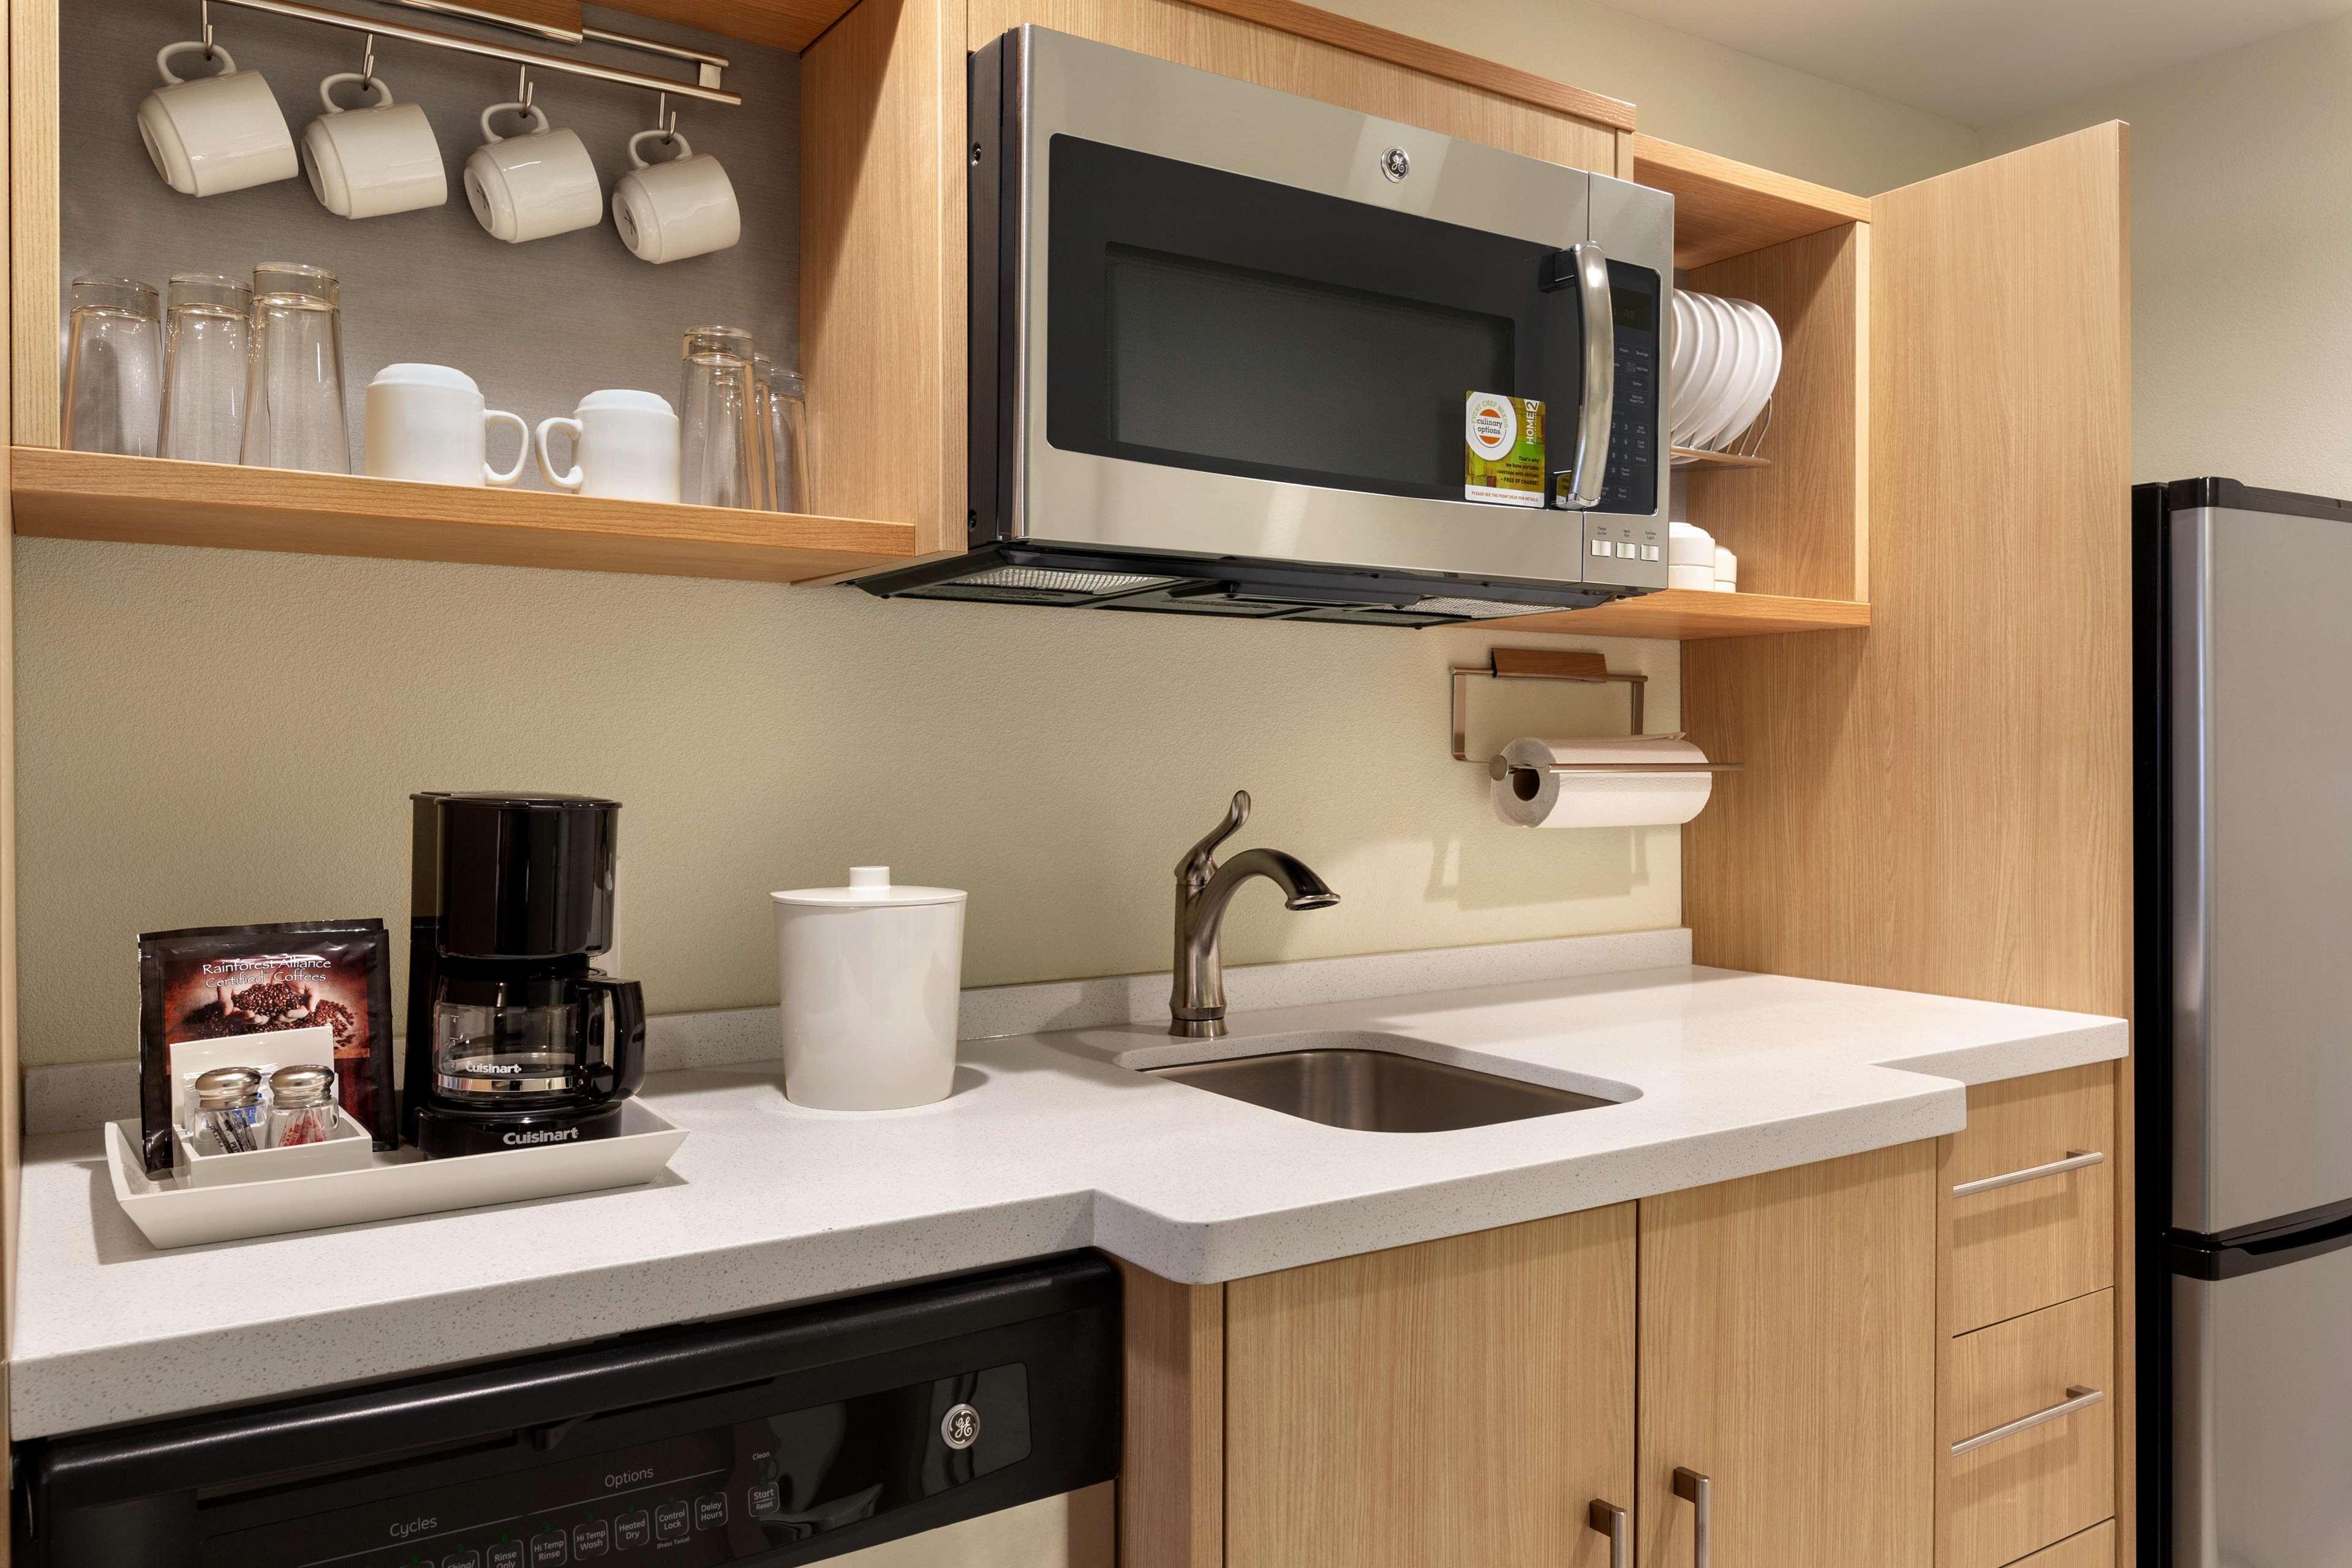 Home2 Suites by Hilton Waco image 2